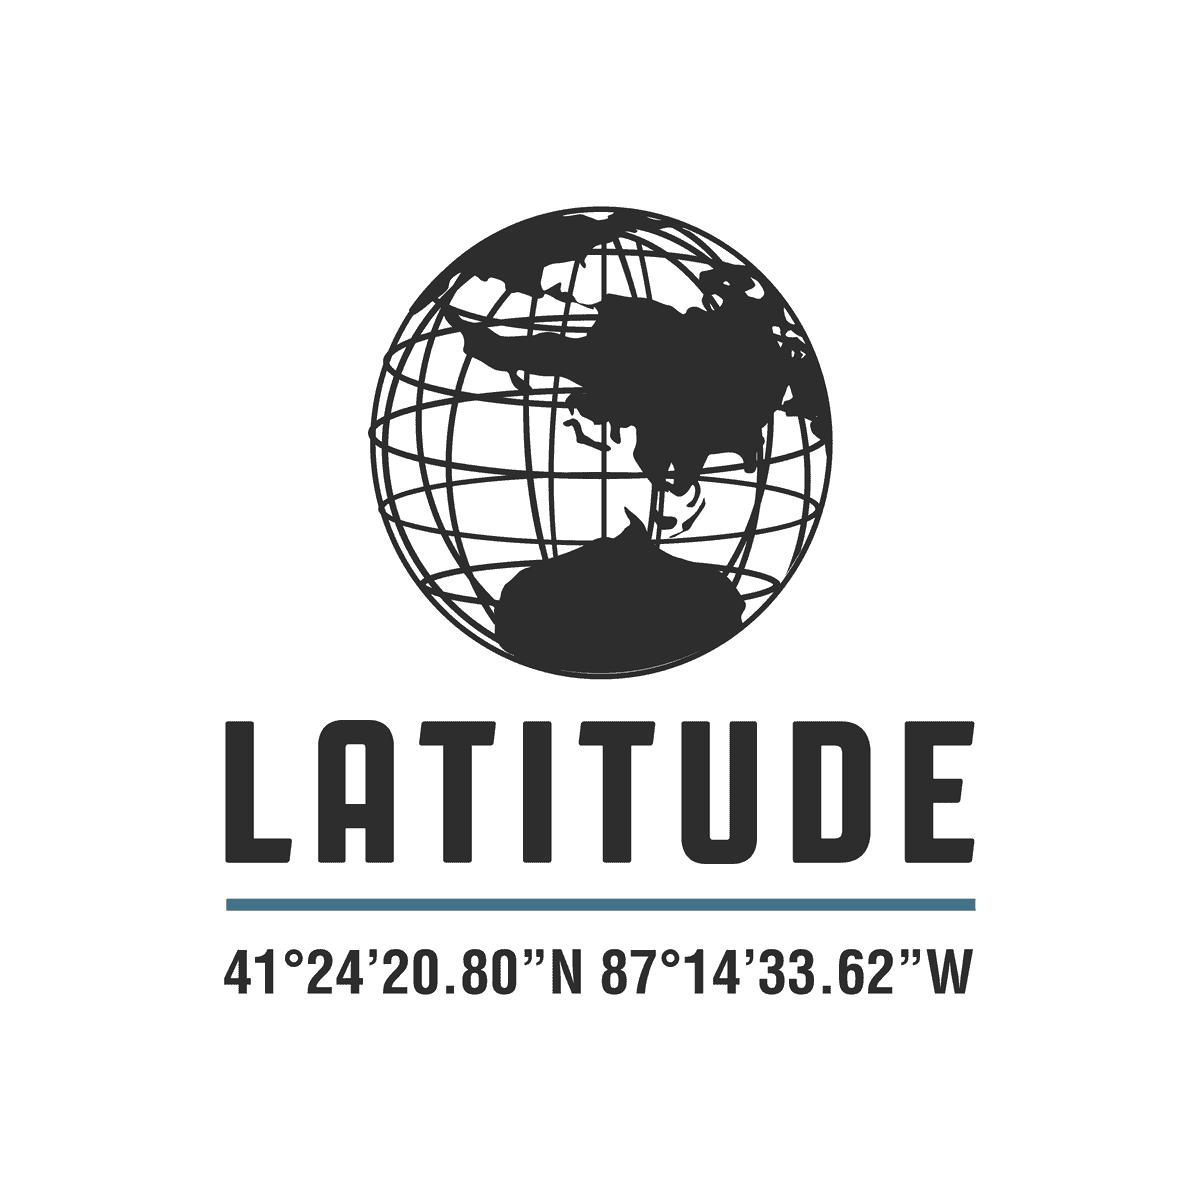 https://diamondpeakhomes.com/wp-content/uploads/2020/11/latitude-logo-2.png